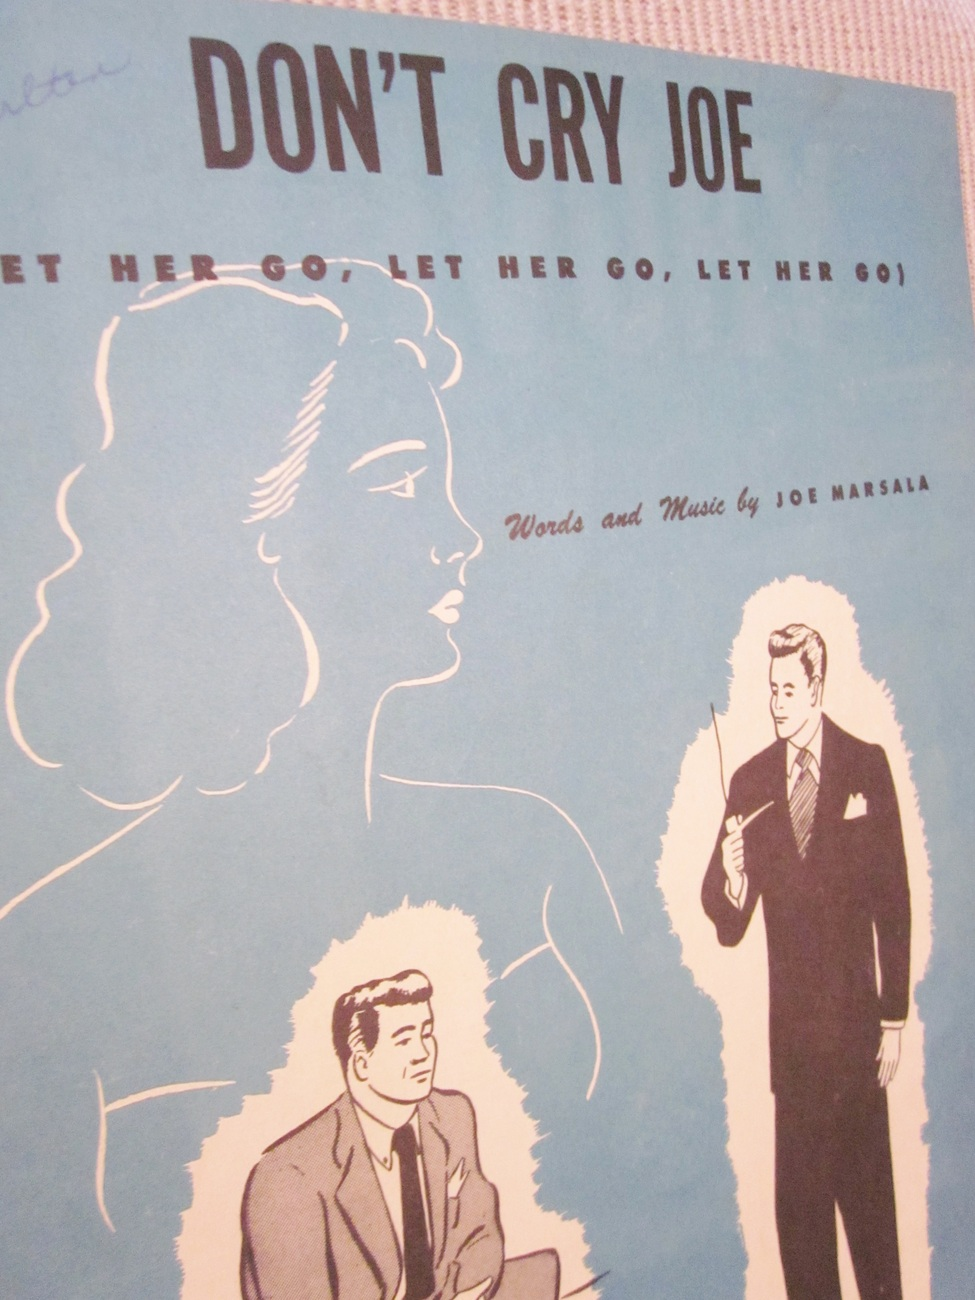 Vintage Sheet Music Don't Cry Joe 1949 by Joe Marsala